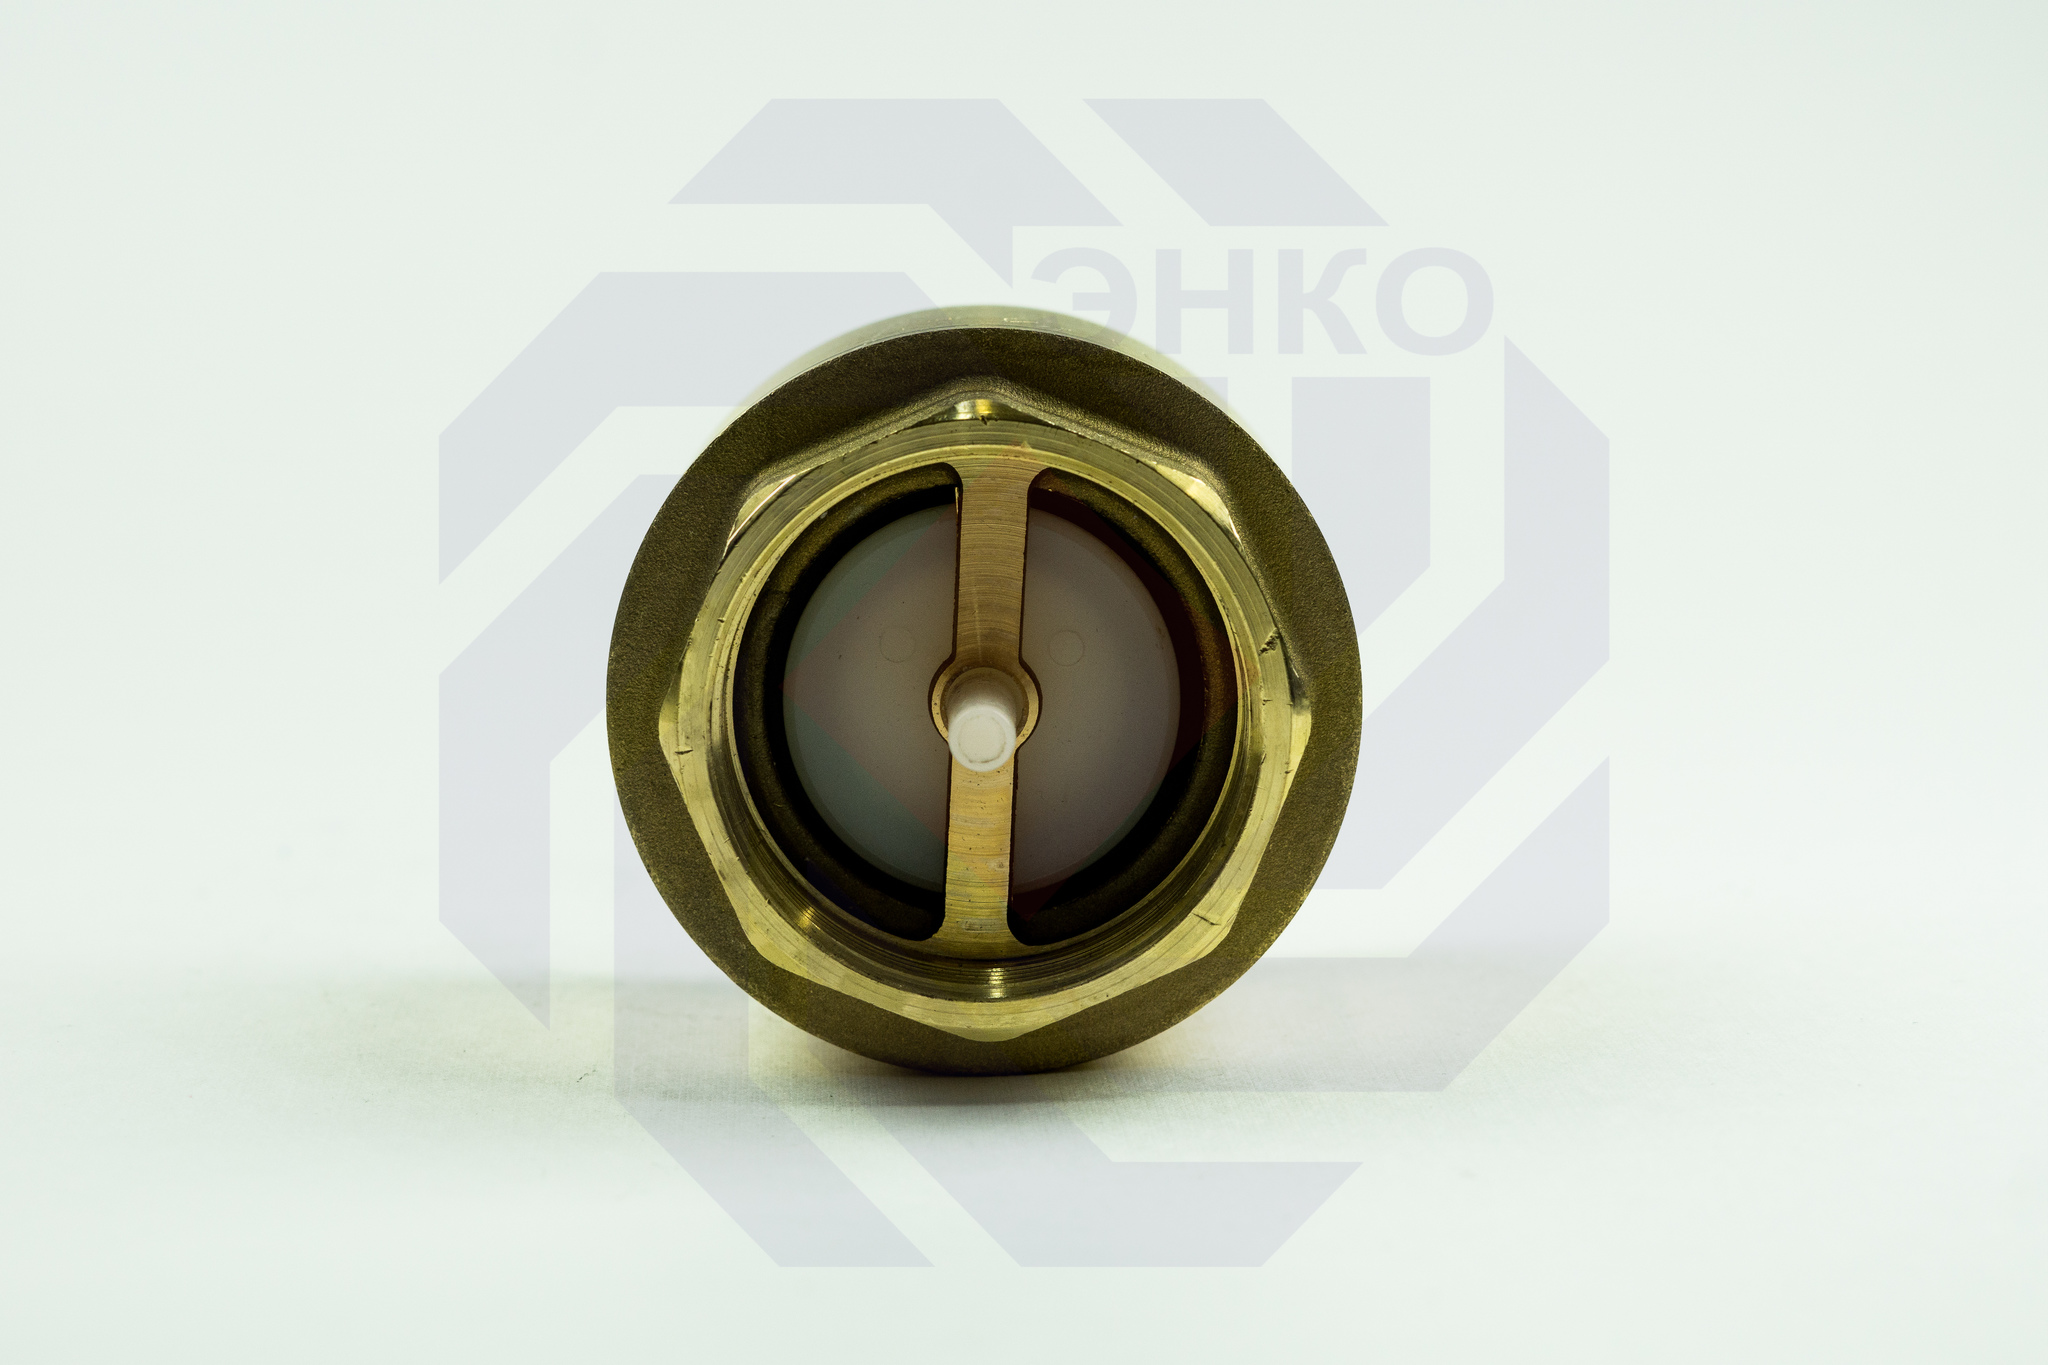 Клапан обратный ВР/ВР BUGATTI EURO 1000 2